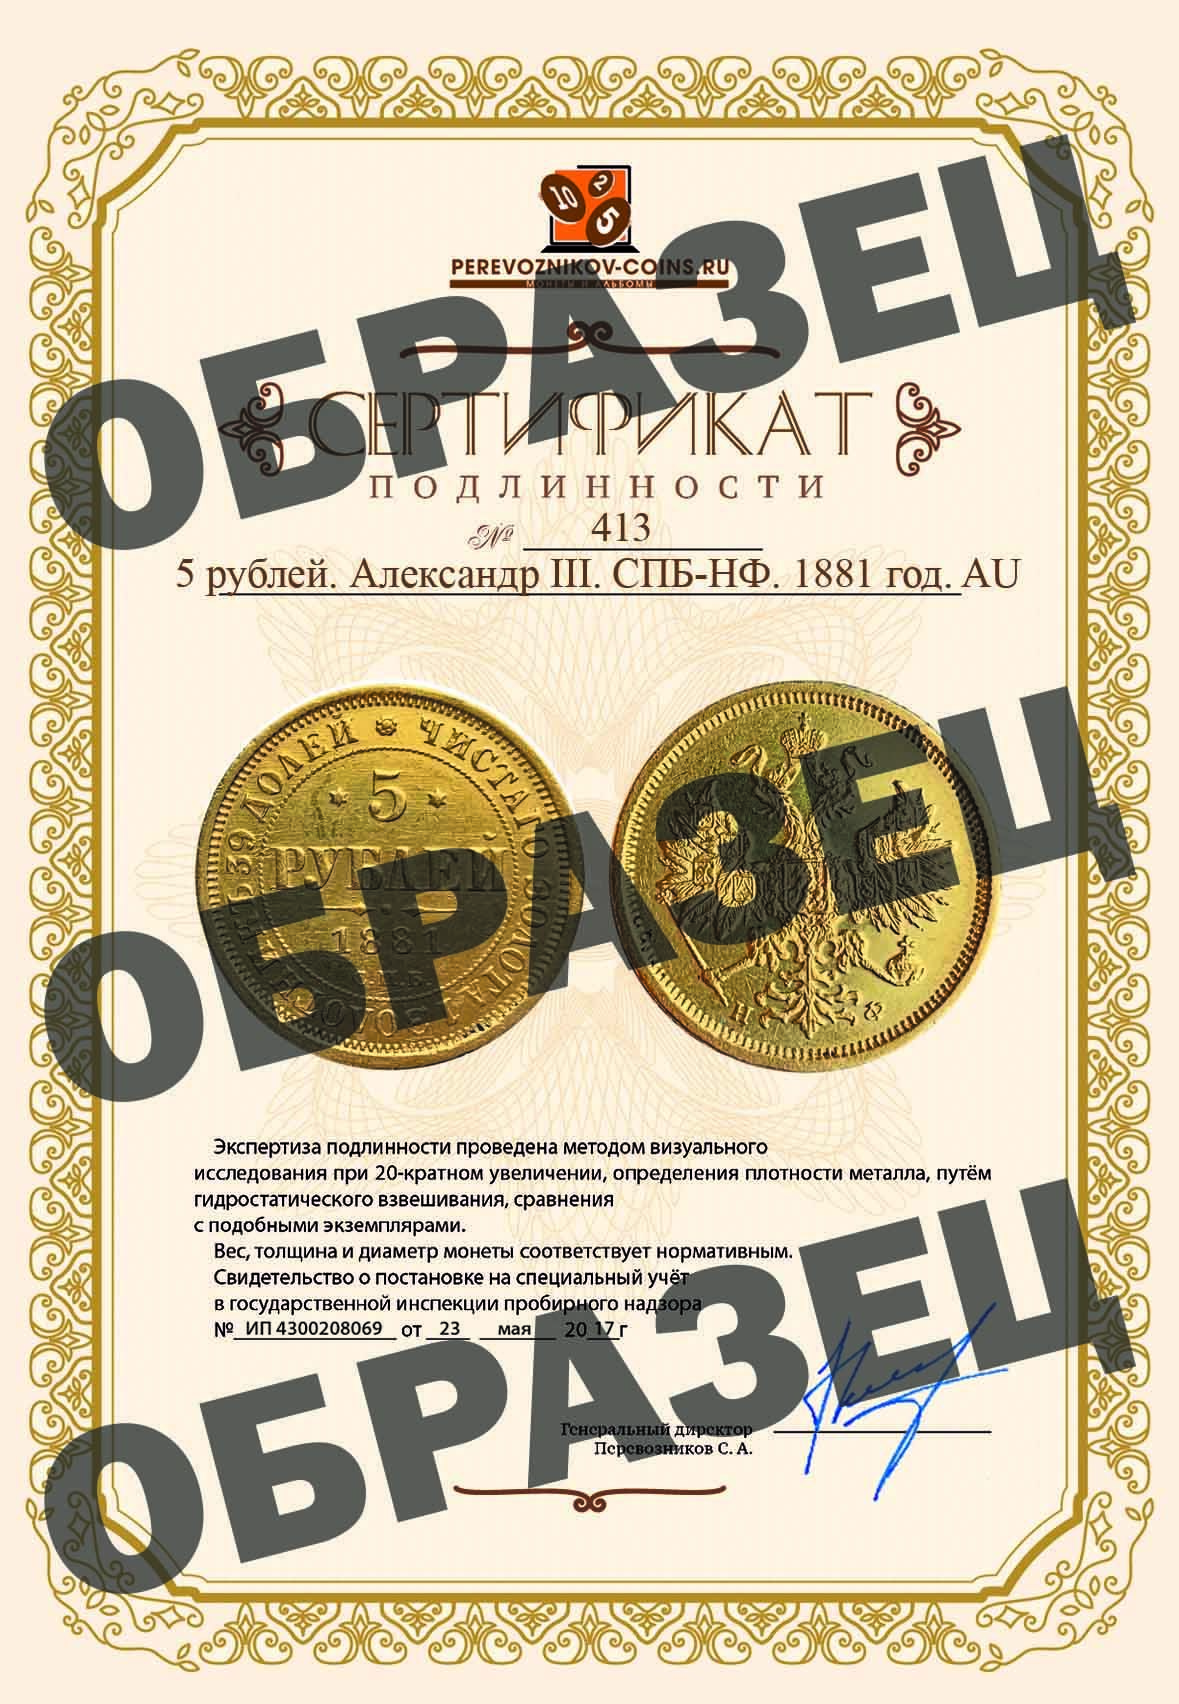 5 рублей. Александр III. СПБ-HФ. 1881 год. AU